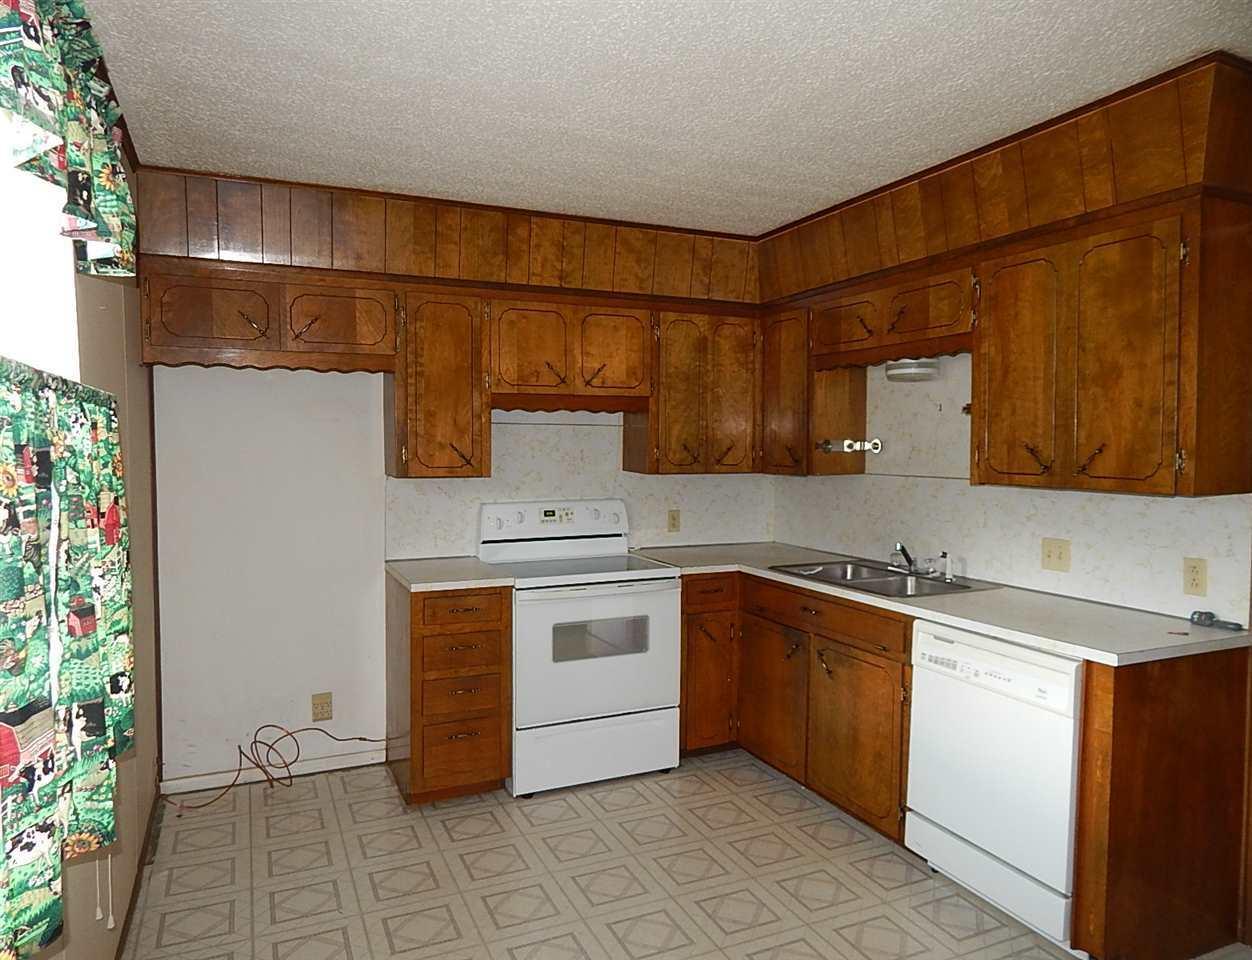 Sold Intraoffice W/MLS | 633 S 7th Fairfax, OK 74637 6